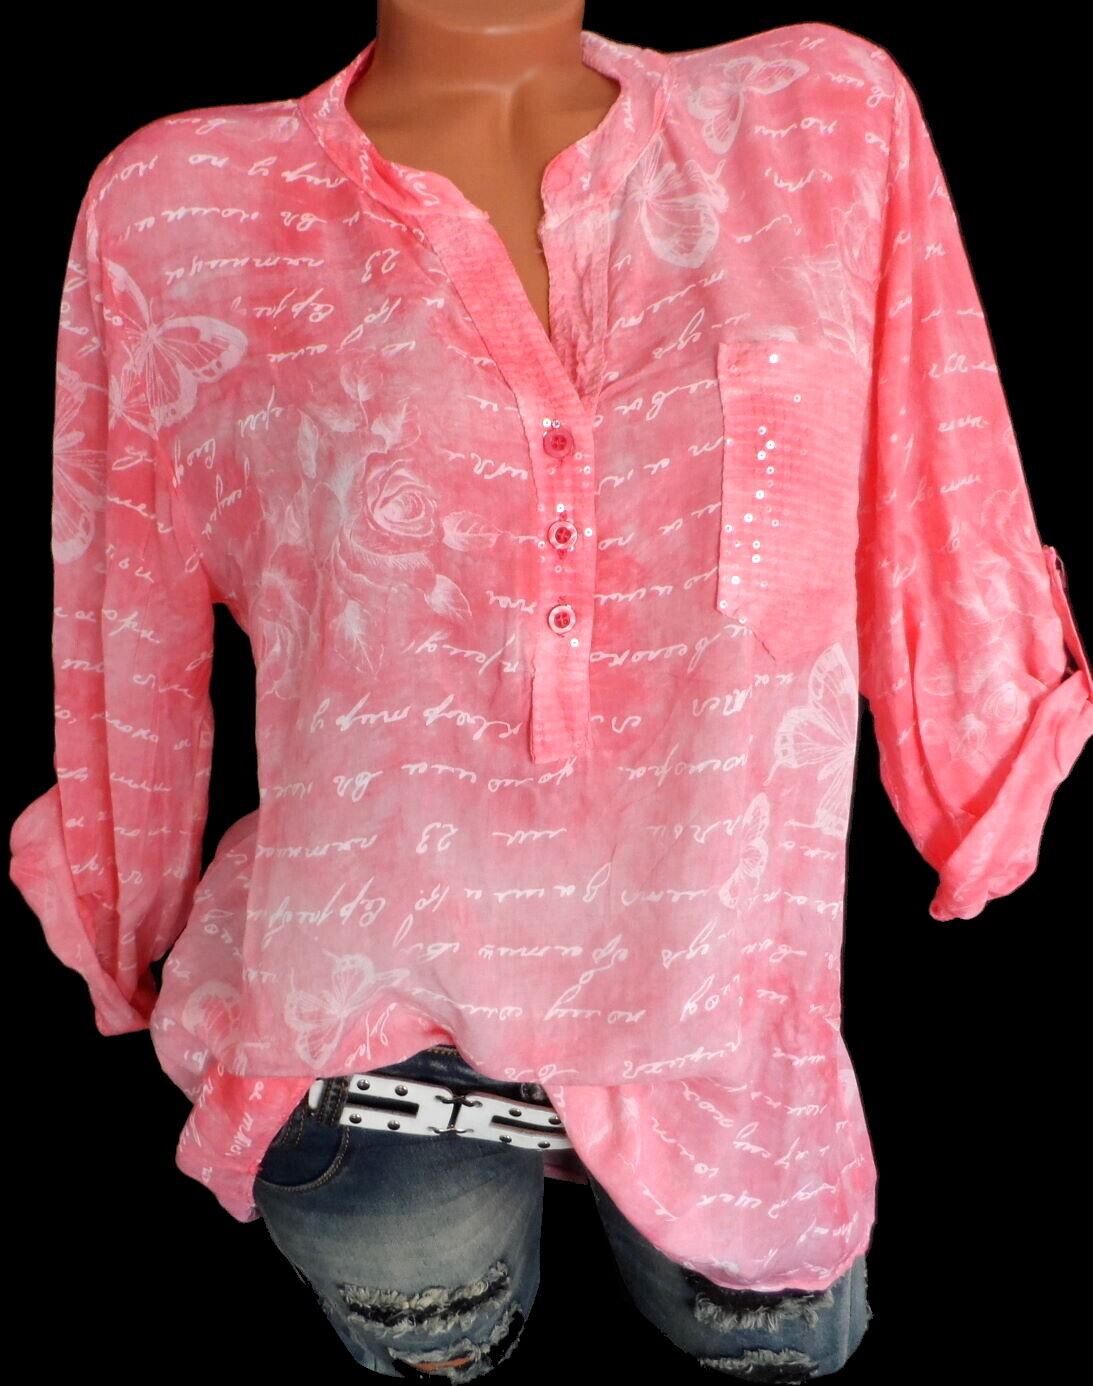 Damenbluse Hemdbluse Tunika Sommer Bluse Shirt Hemd Coral M L XL 2XL 38 40 42 44